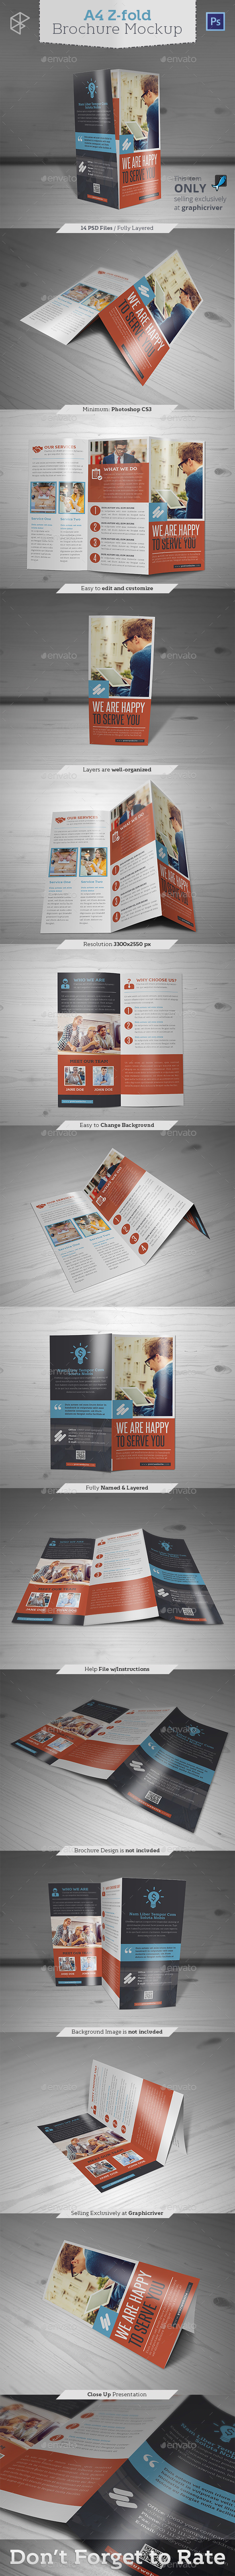 A4 Z-fold Brochure Mockup - Brochures Print